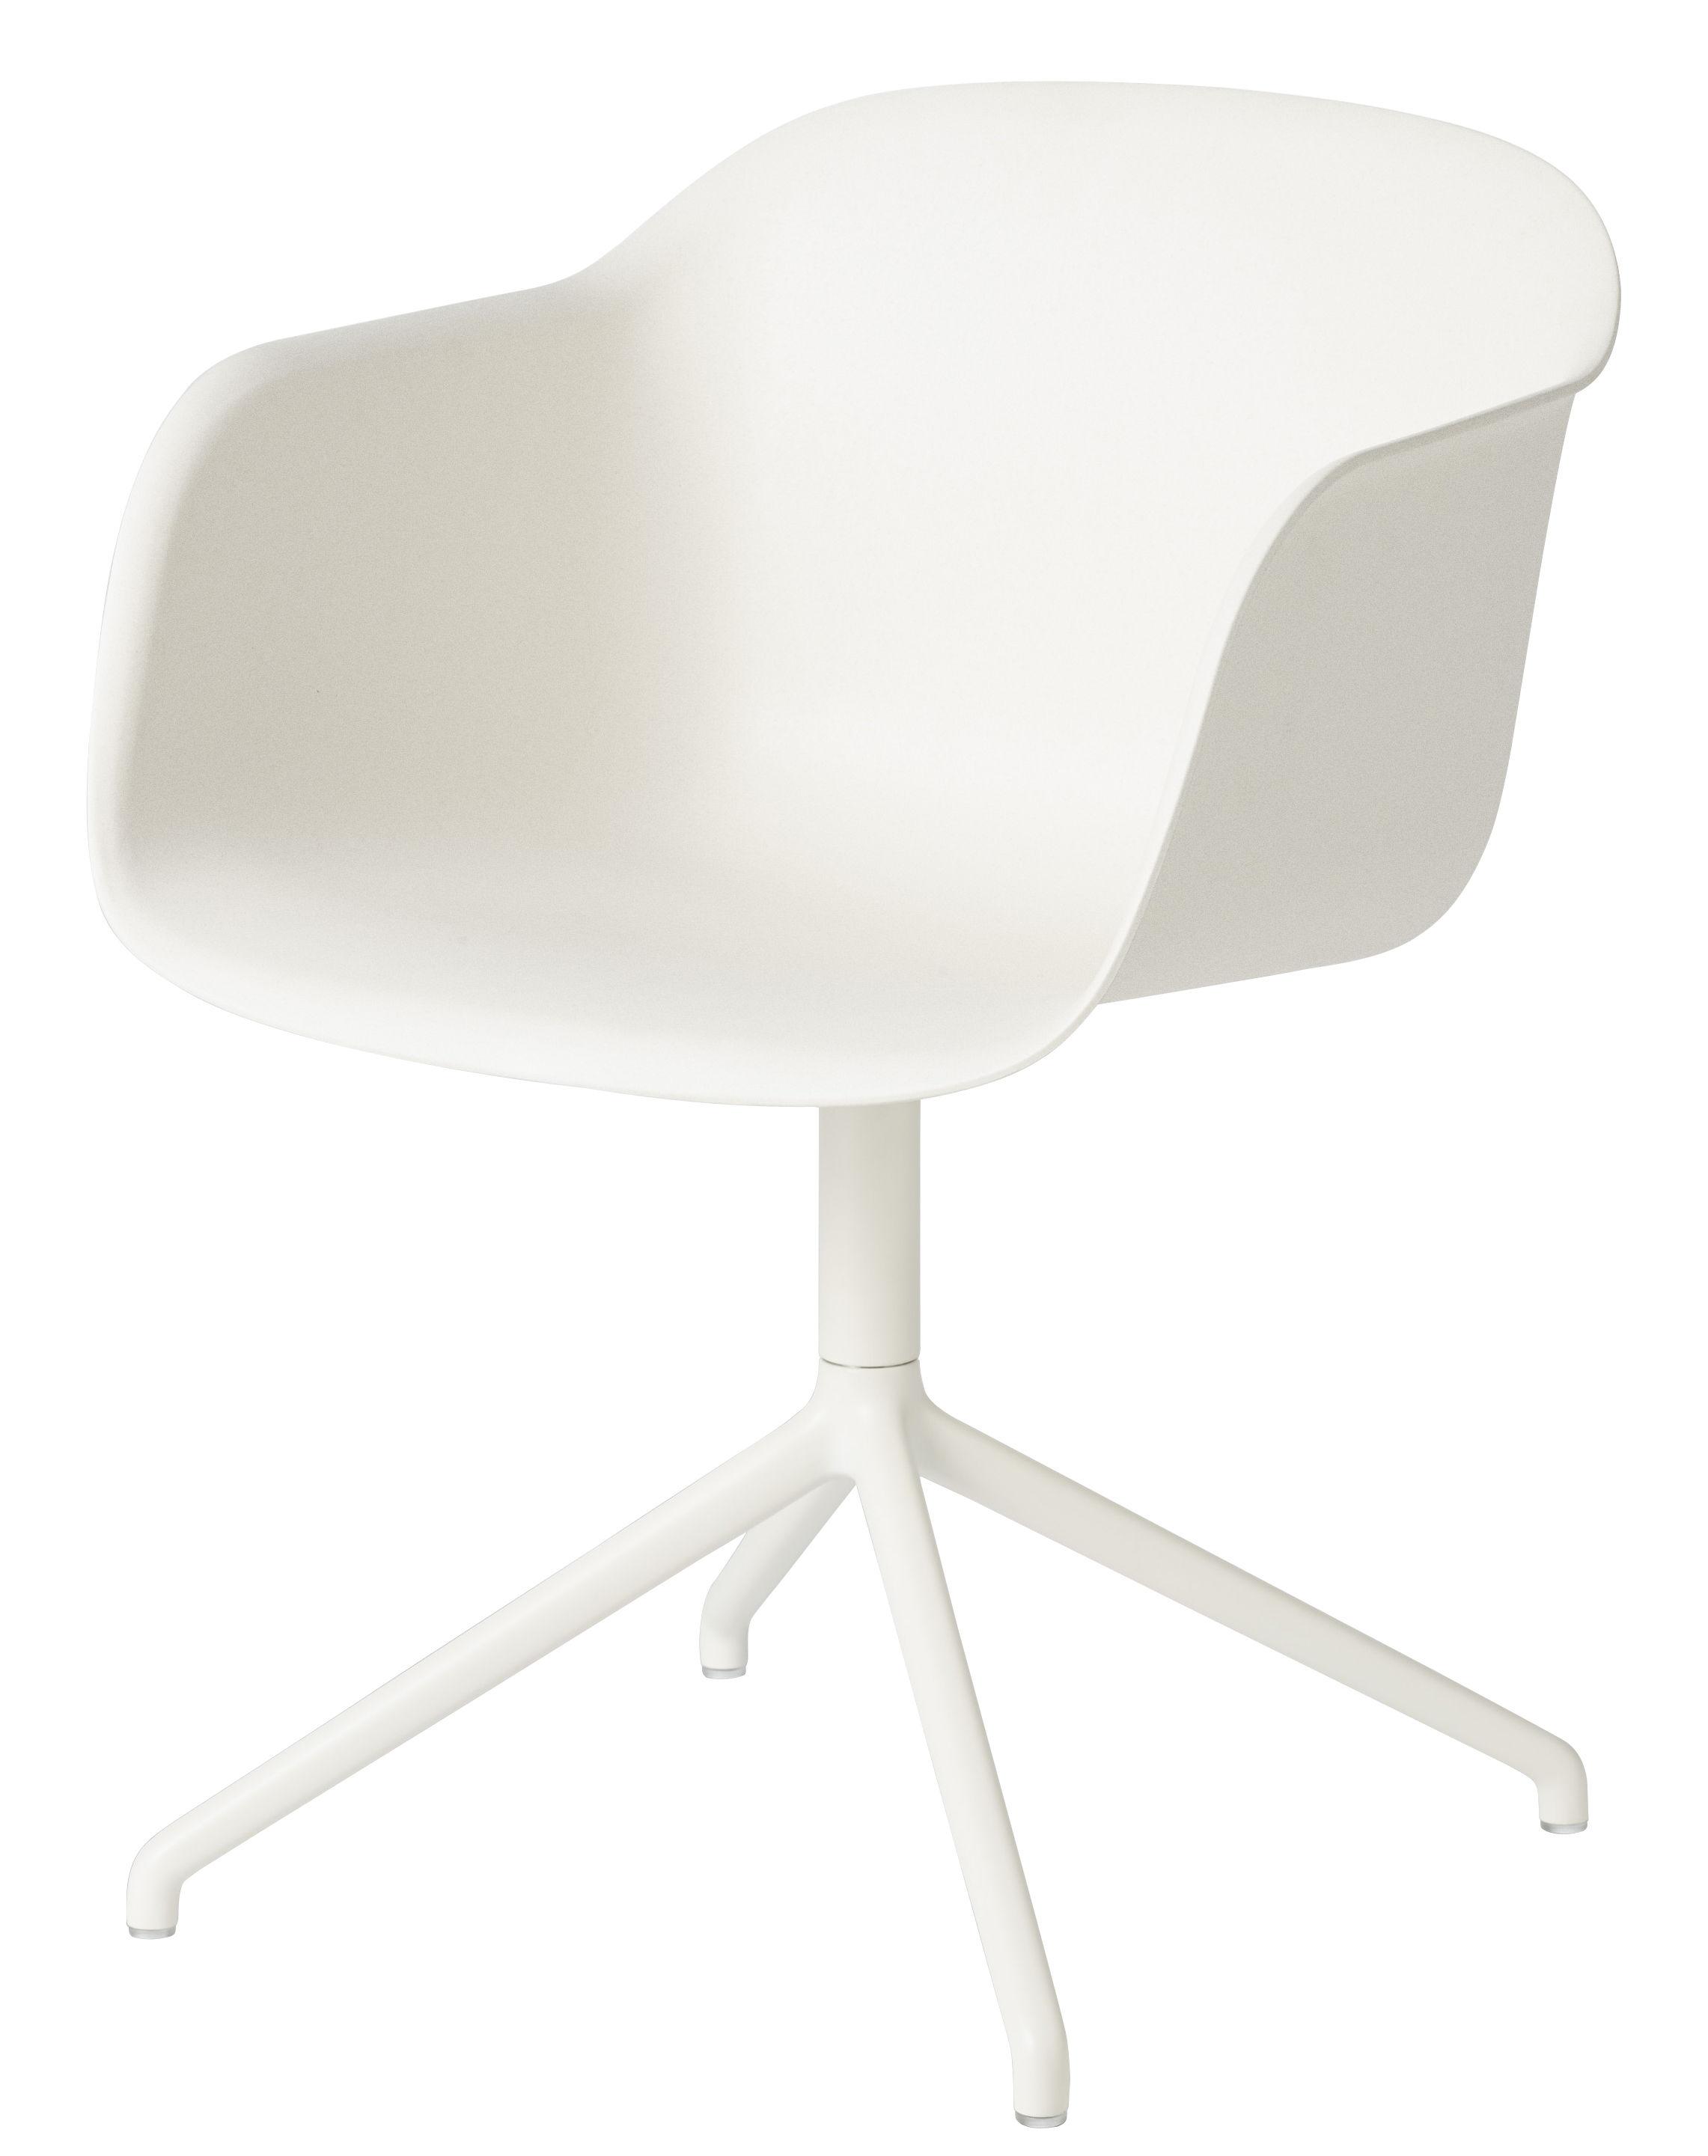 fauteuil pivotant fiber blanc pieds blancs muuto. Black Bedroom Furniture Sets. Home Design Ideas